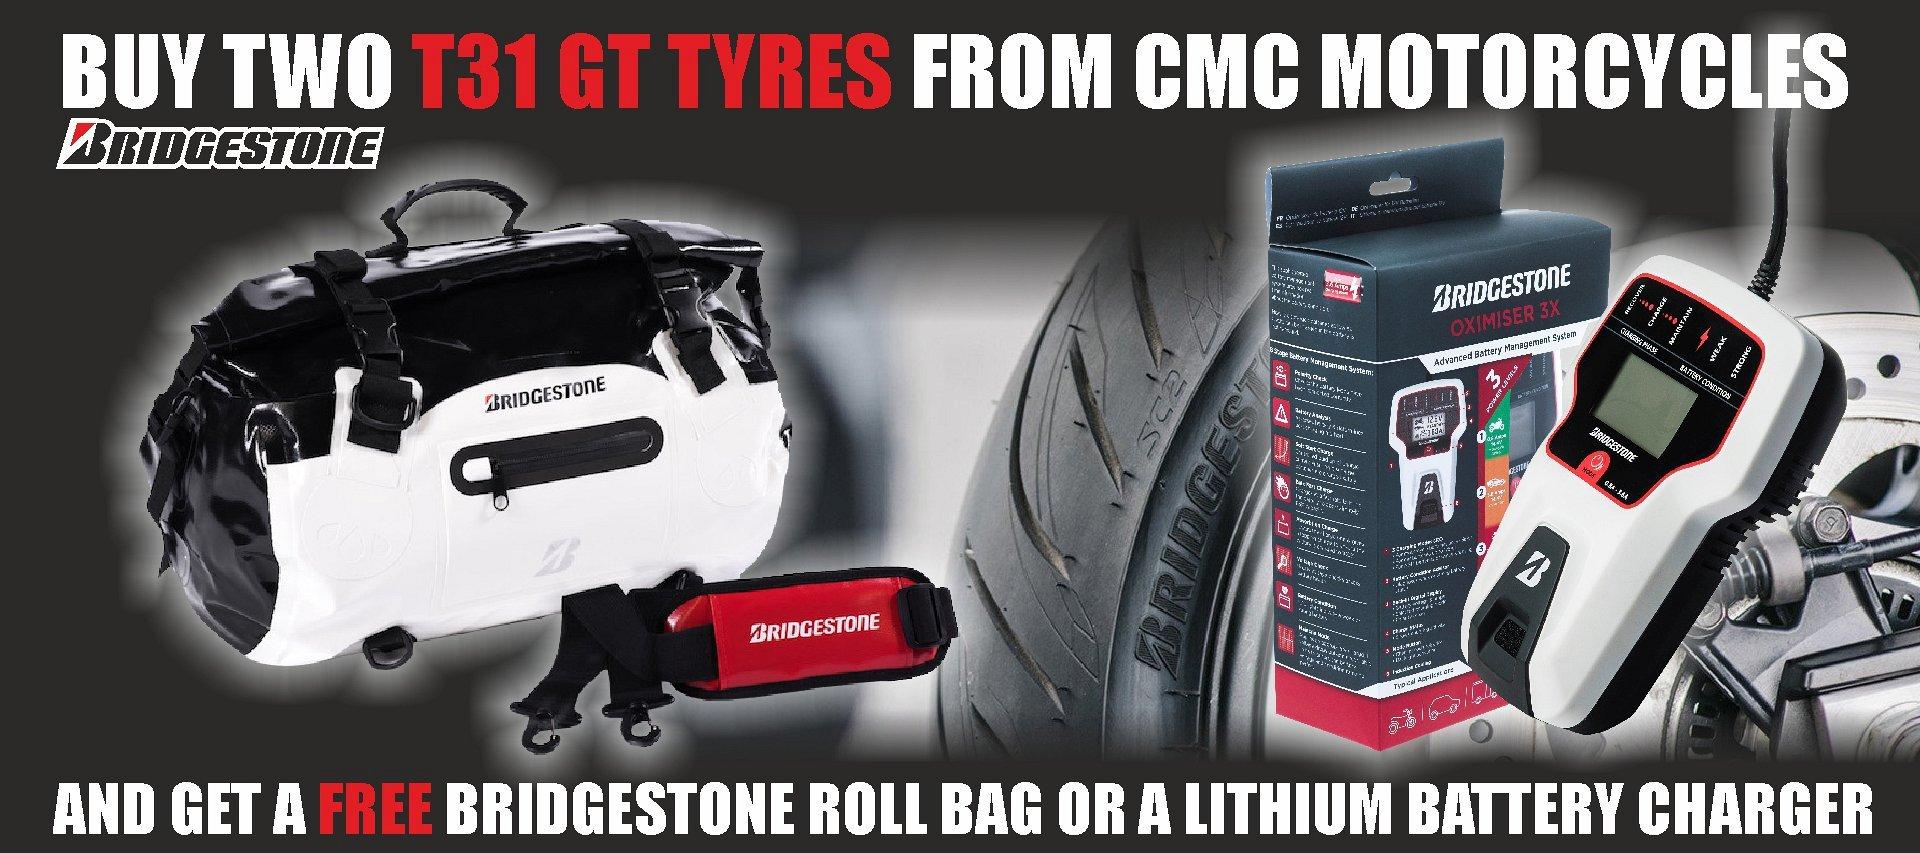 when you buy a pair of Bridgestone T31 GT tyres